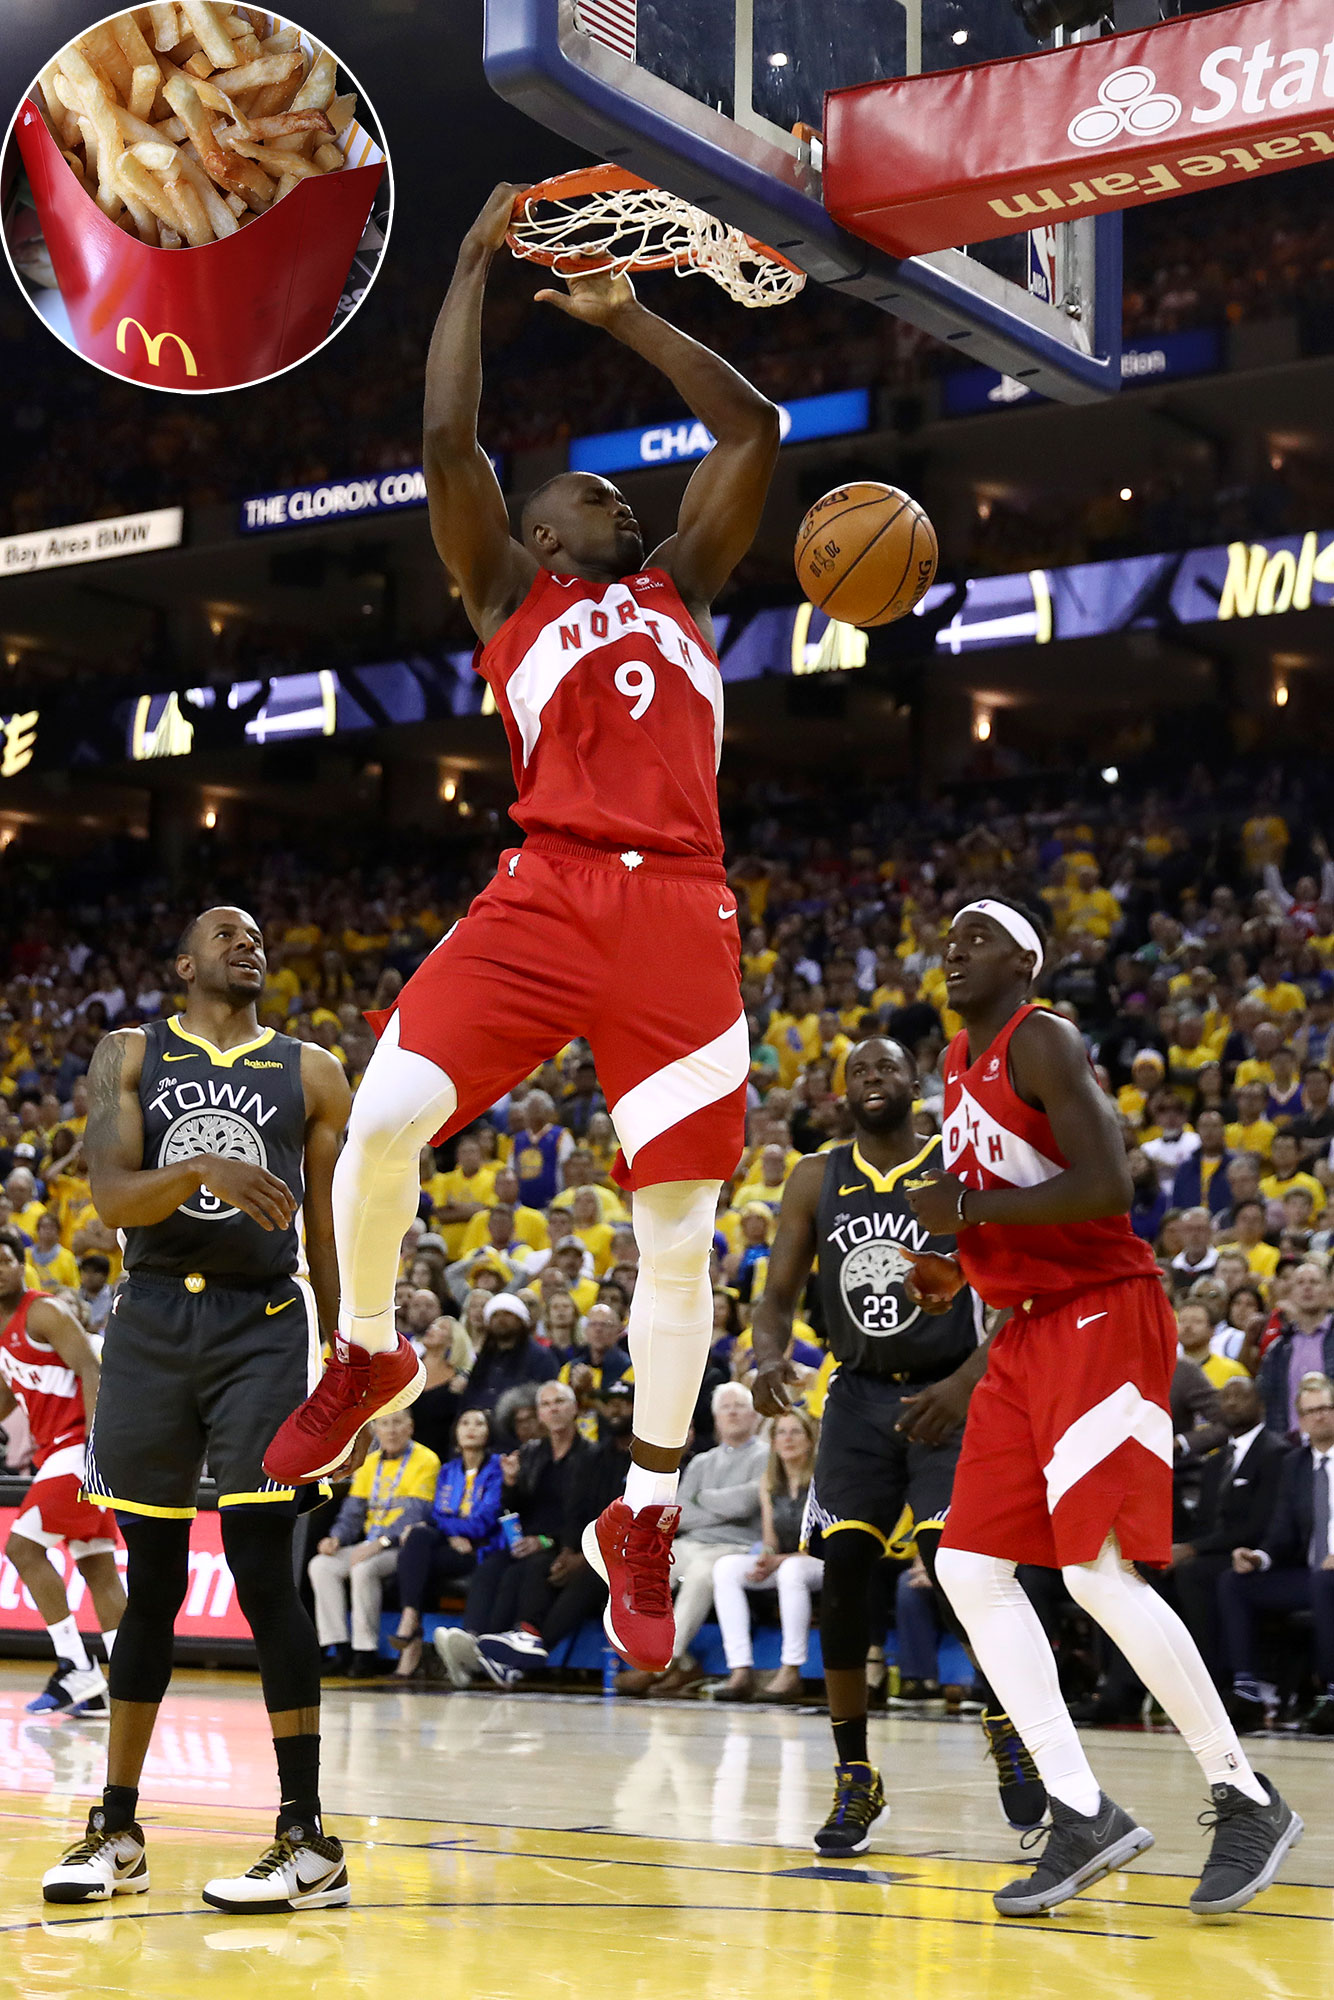 premium selection 888da 13ebb Toronto Raptors Skills Cost McDonald's $5.8 Million in Free ...